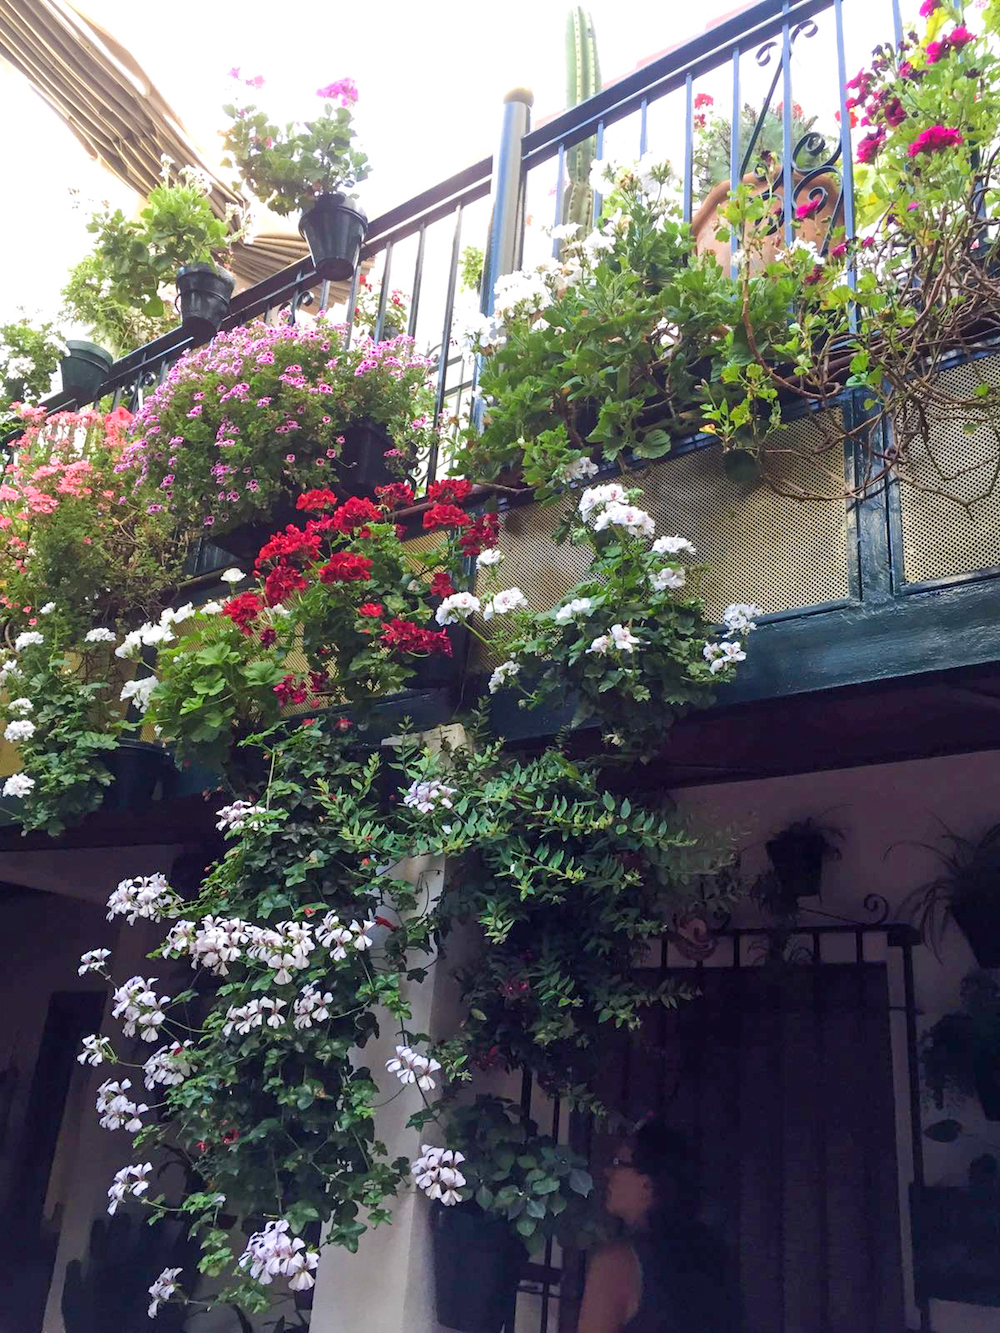 13 - festival in córdoba - romantische streken - straatje - bloemen